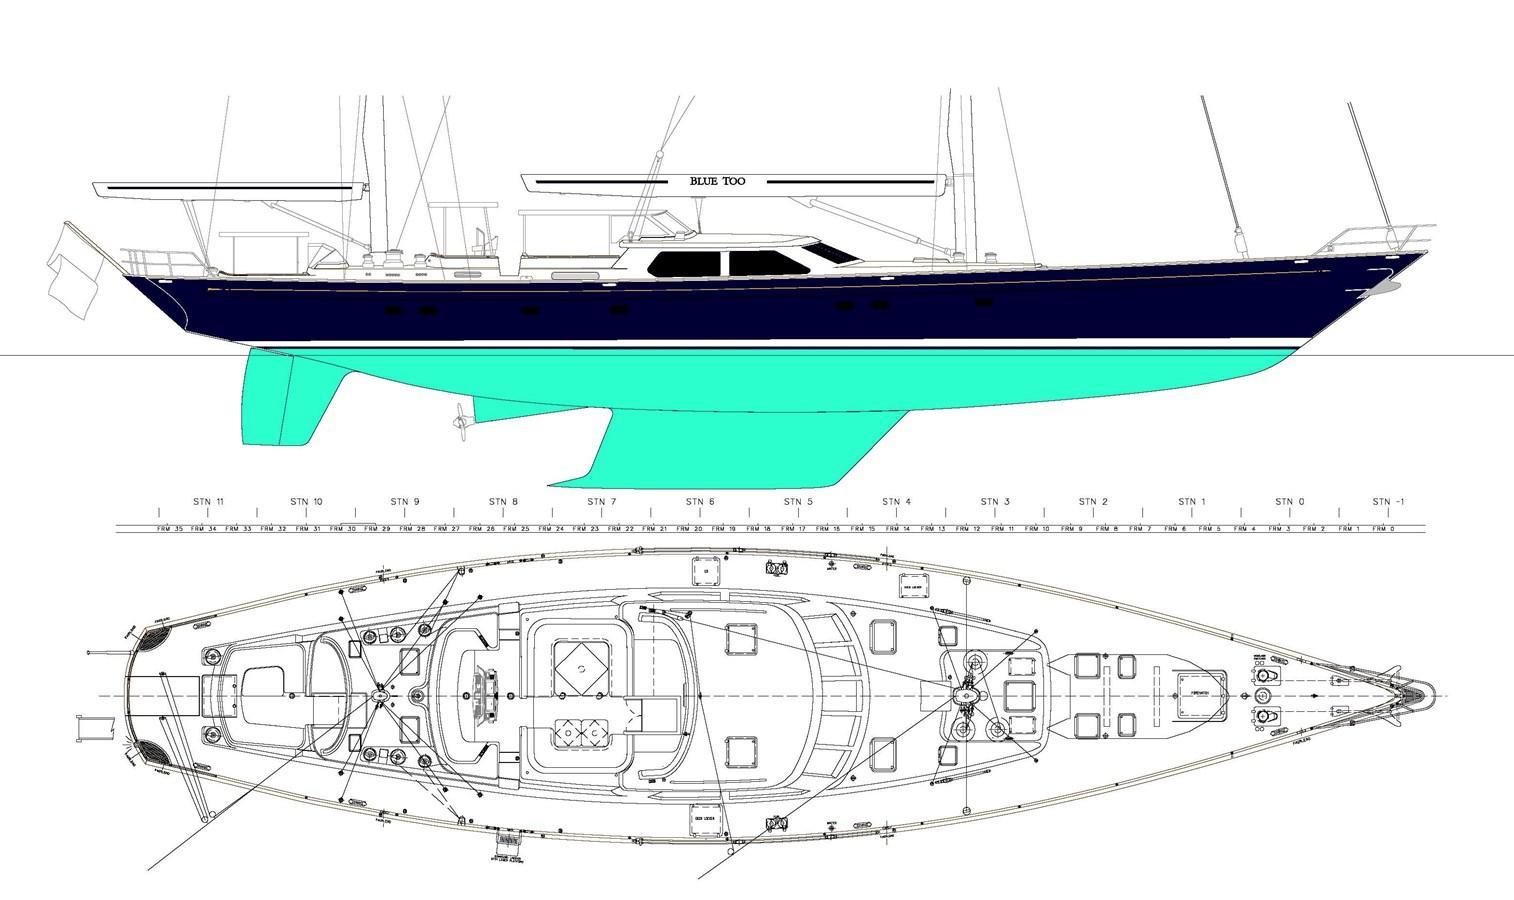 034 Blue Too Deck Plan 1998 ALLOY Sailing Ketch Cruising Ketch 2544049